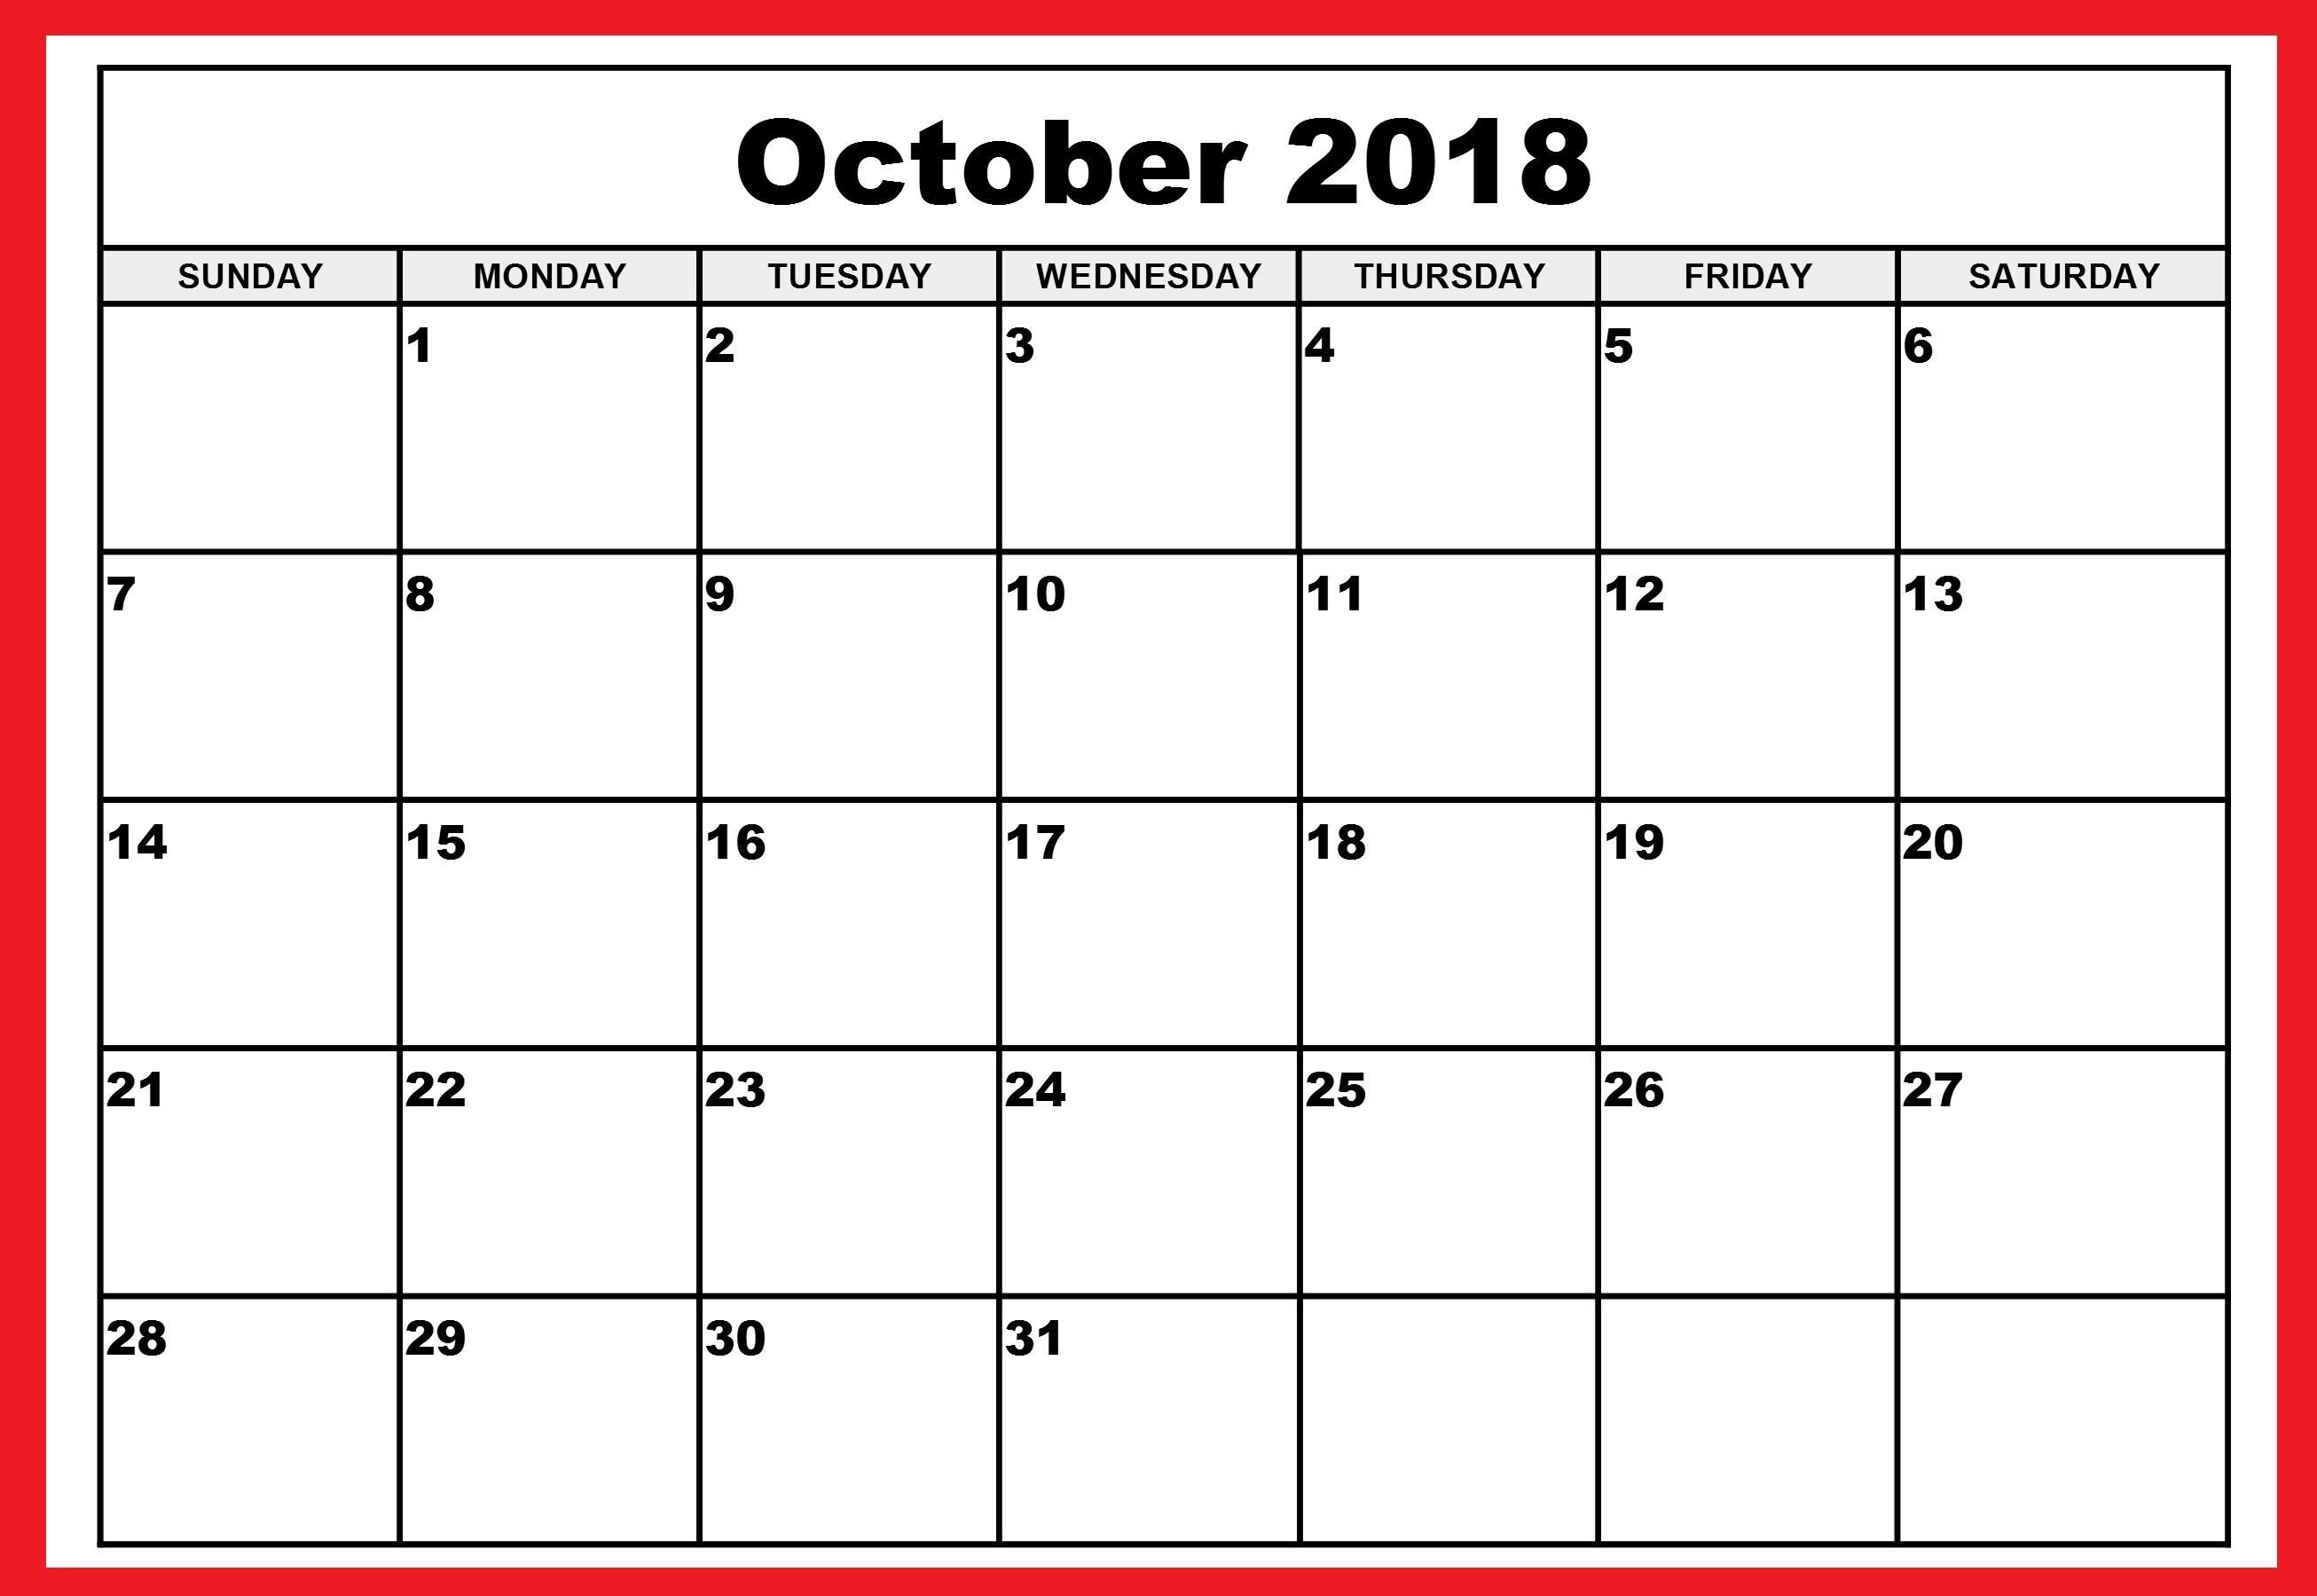 free printable october 2018 calendar printable calendar 2018 Printable October 2018 Calendar erdferdf